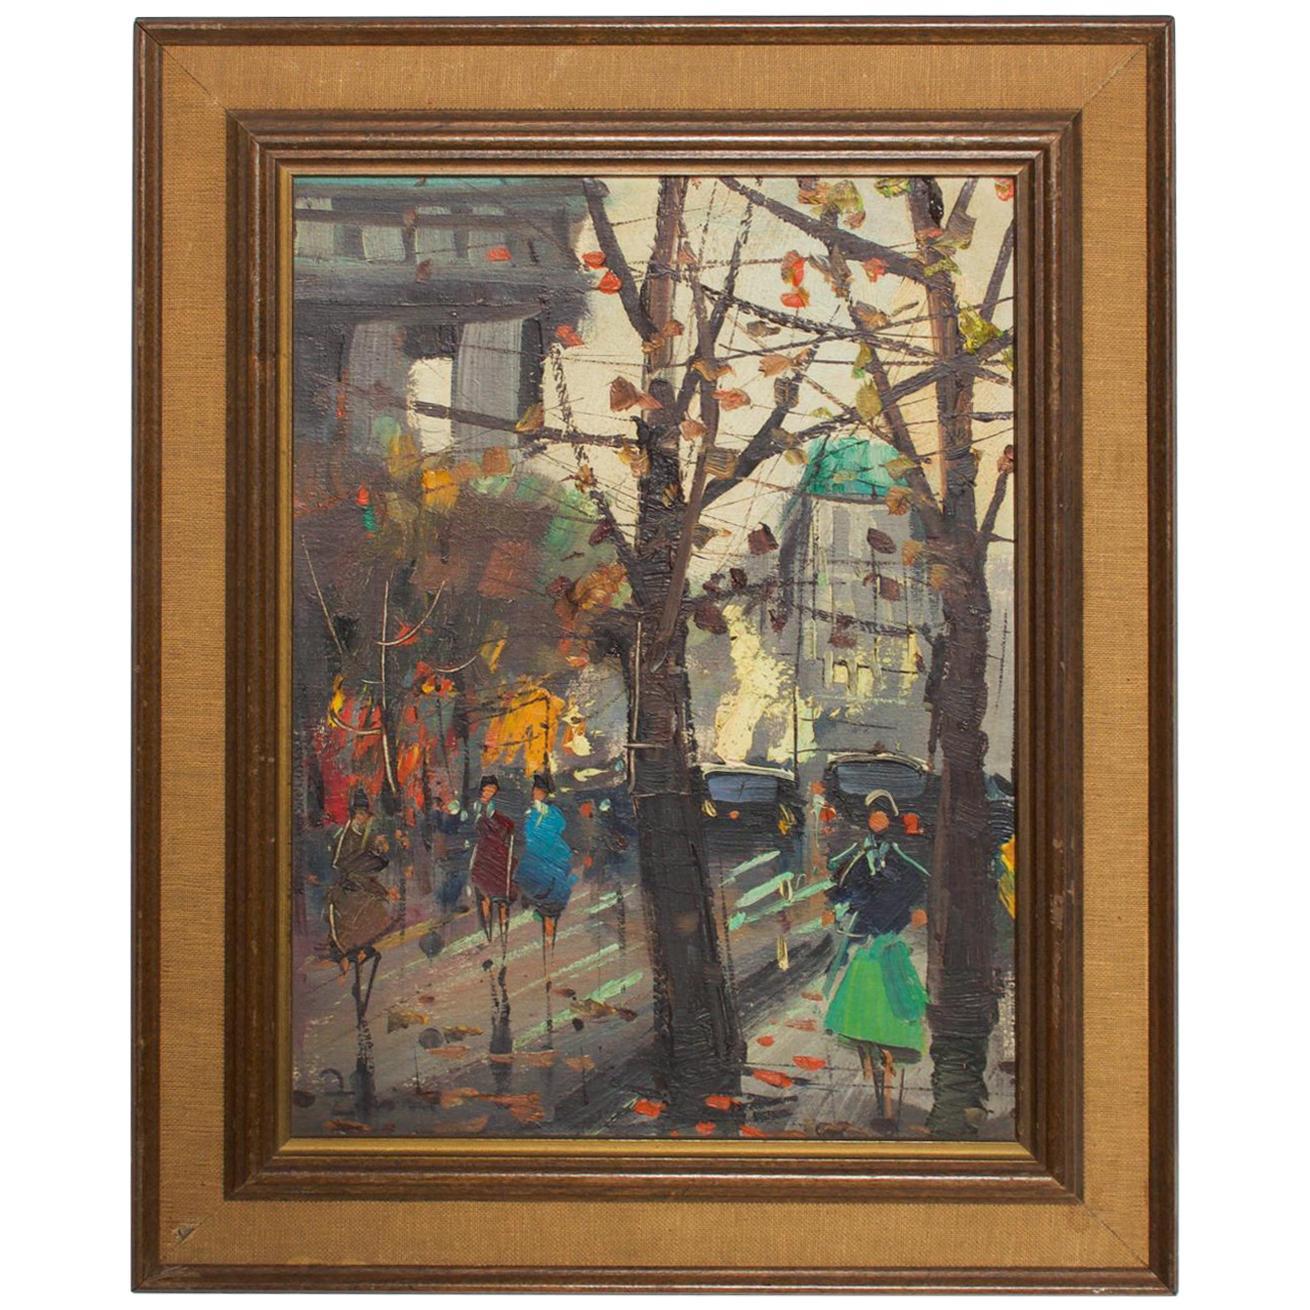 Japanese Influenced Mid Century Modern Art European Landscape Oil Painting